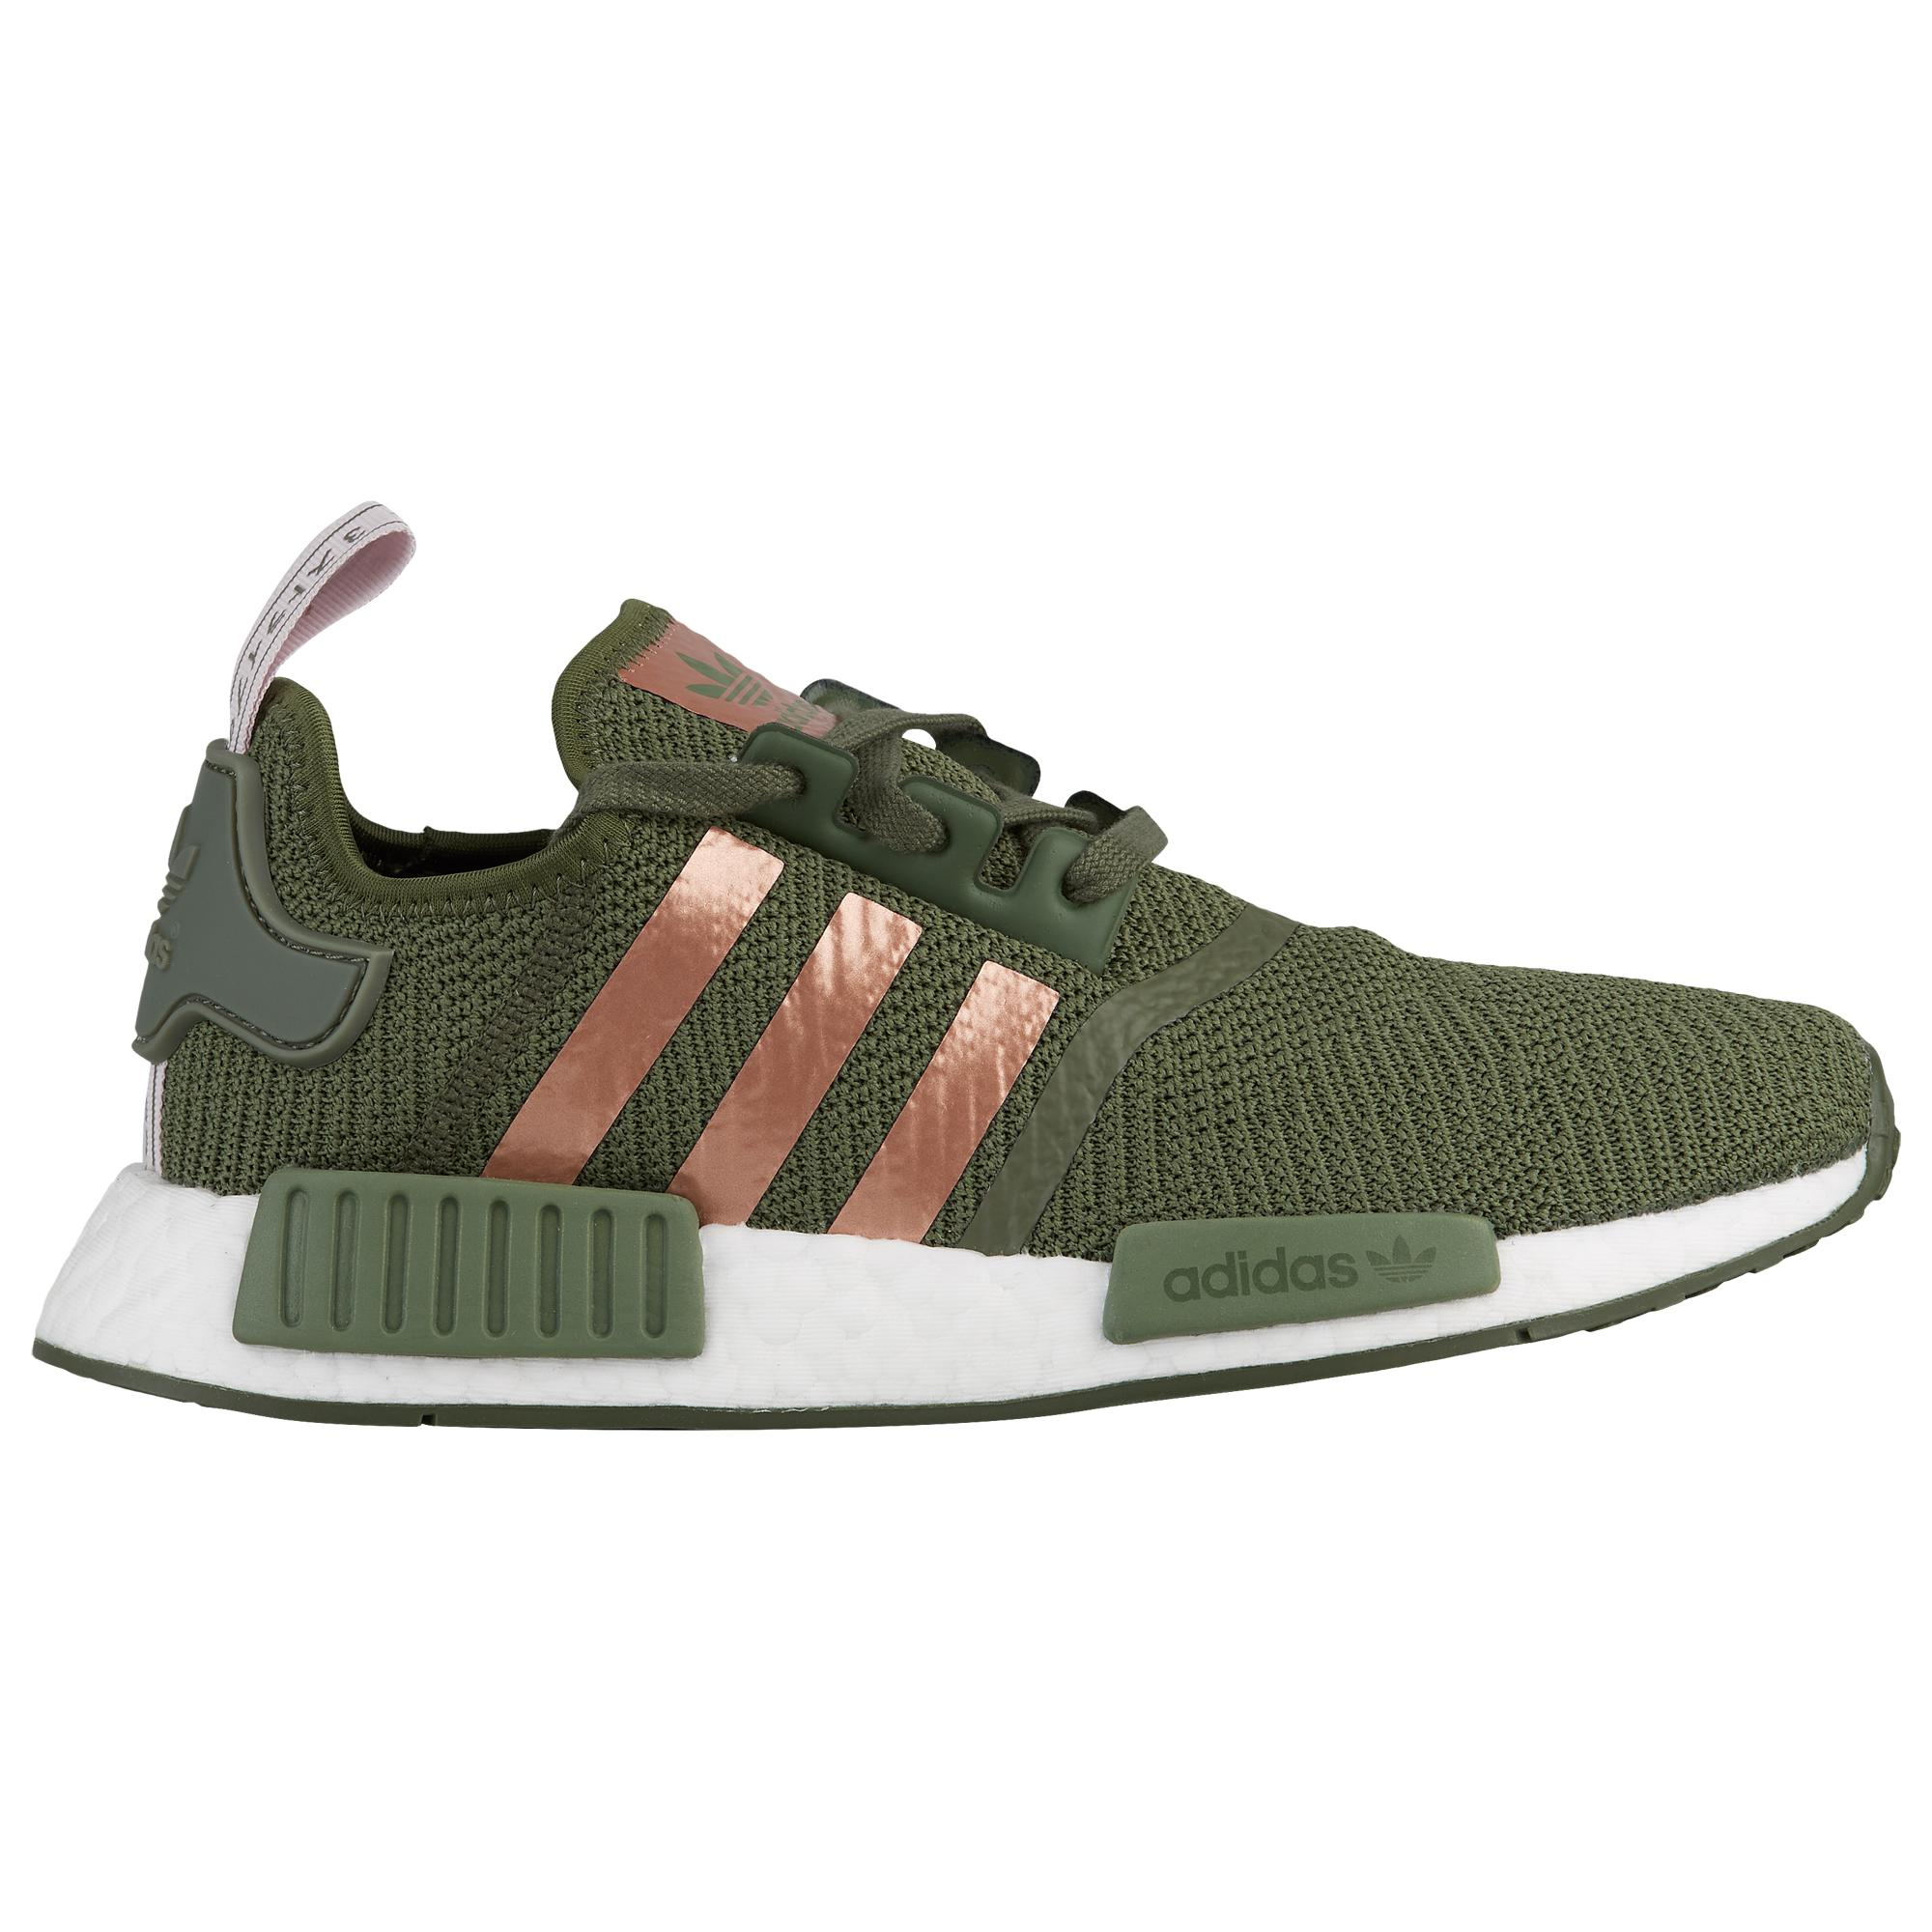 online store 4d5b6 3eea1 Lyst Adidas Originals Nmd R1 In Green